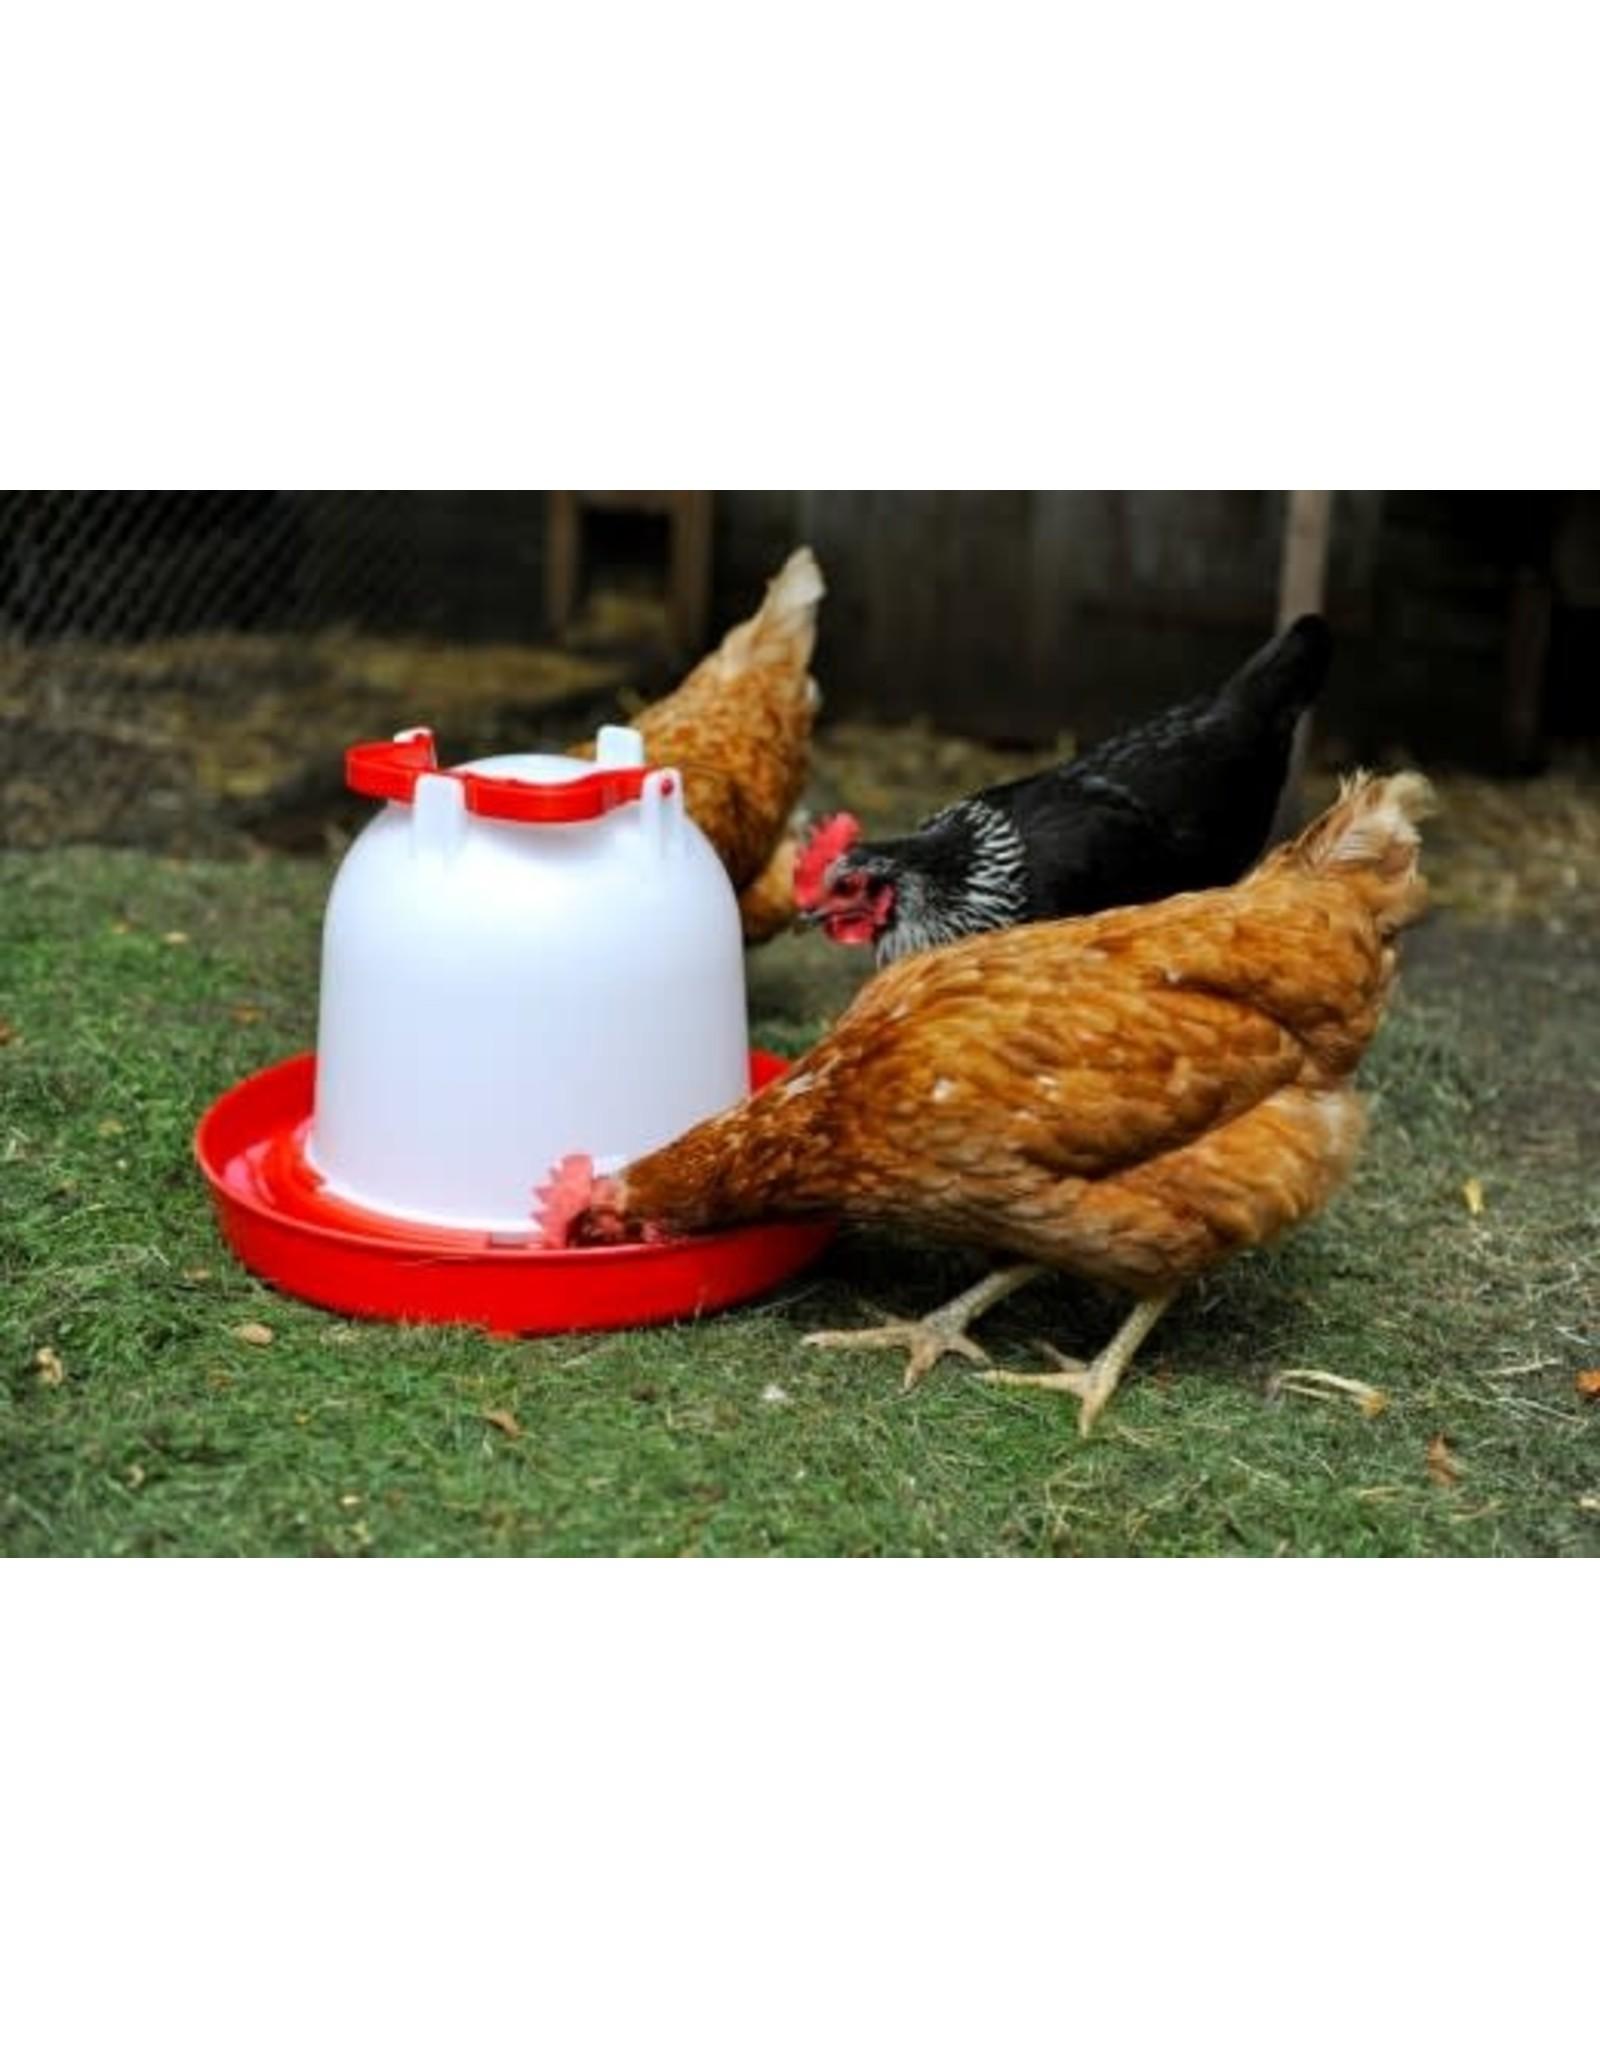 Supa Deluxe Heavy Duty Red & White Plastic Poultry Drinker, 6 litre